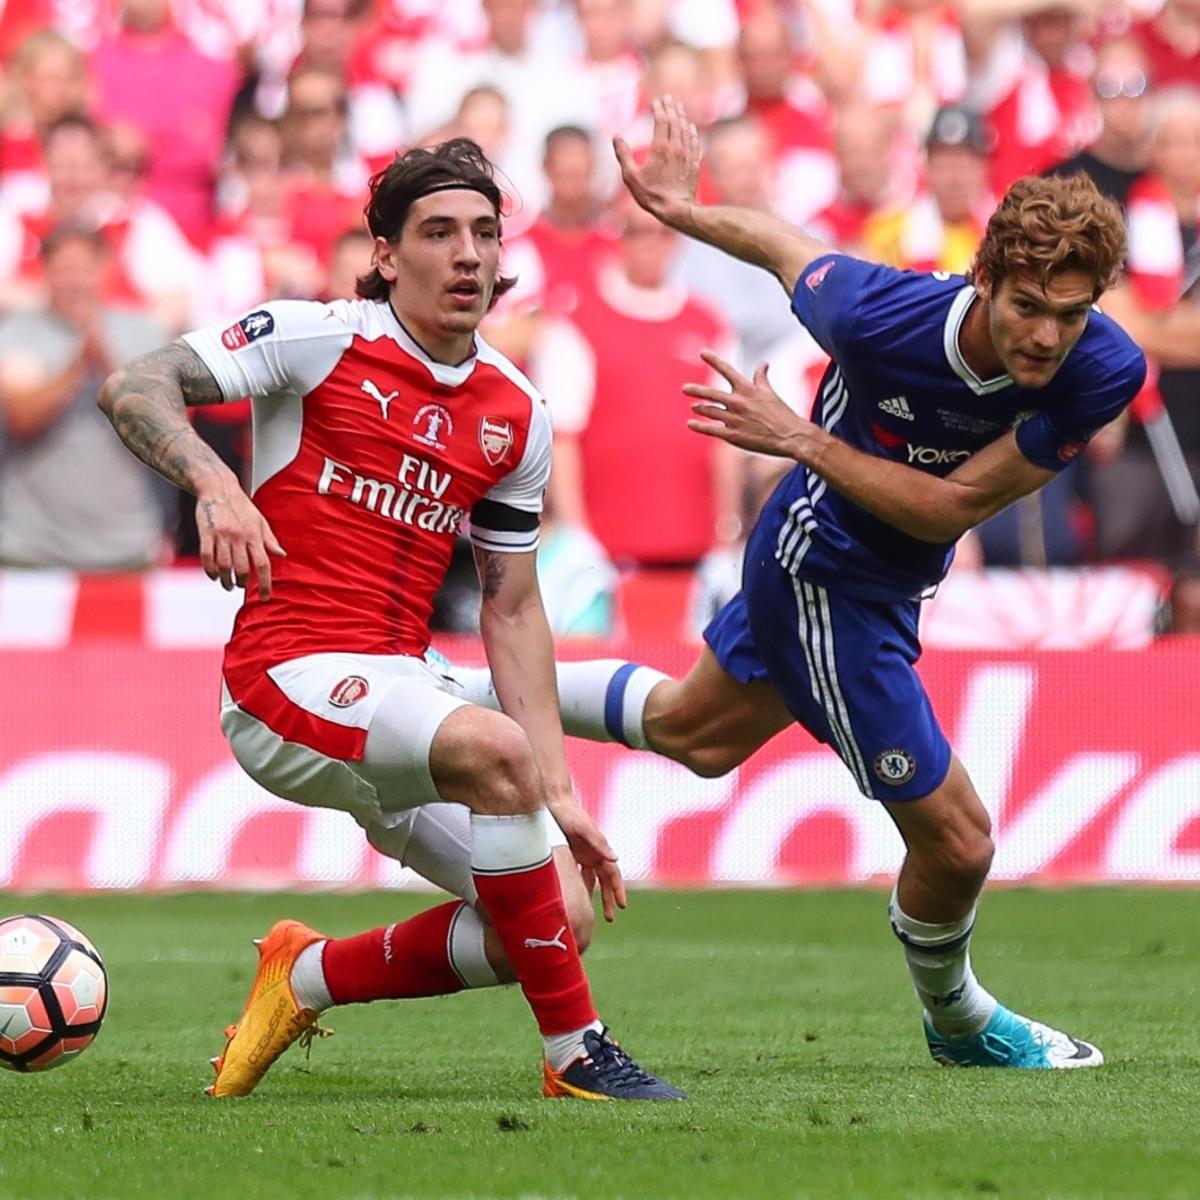 Arsenal Vs Chelsea Live Stream Tv Info For 2017 Pre Season